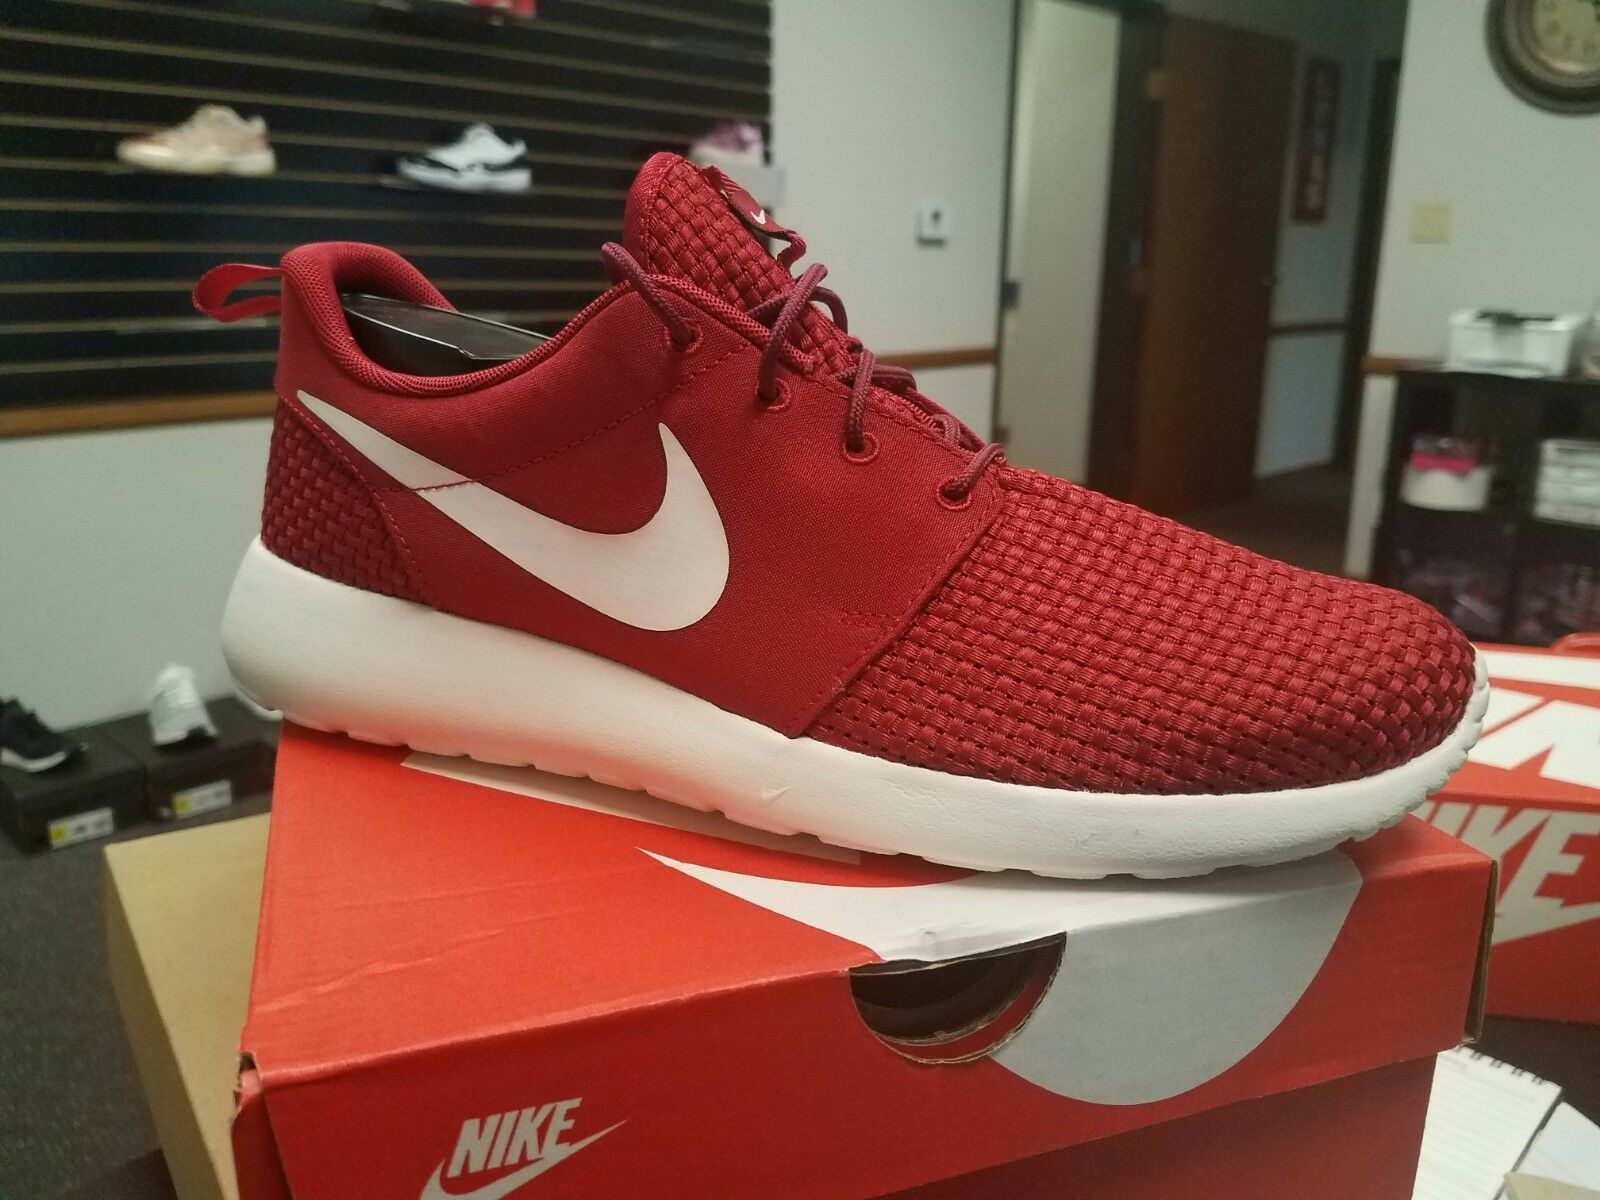 Brand New In Box Men's Running shoes Roshe One SE 844687-605 GYM TEAM RED